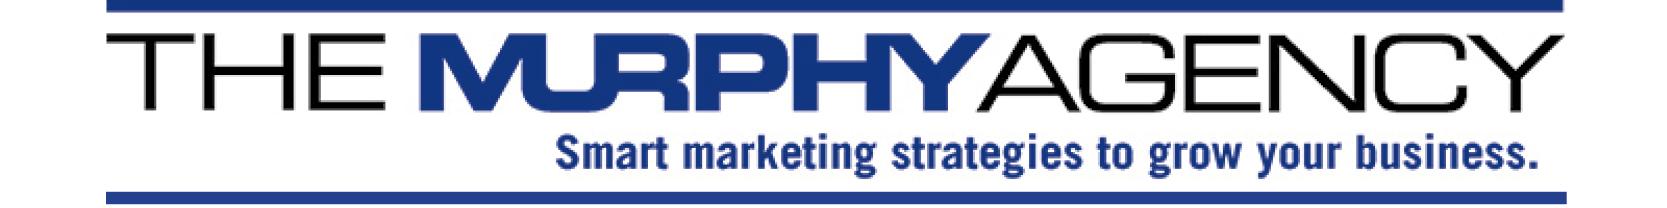 The Murphy Agency